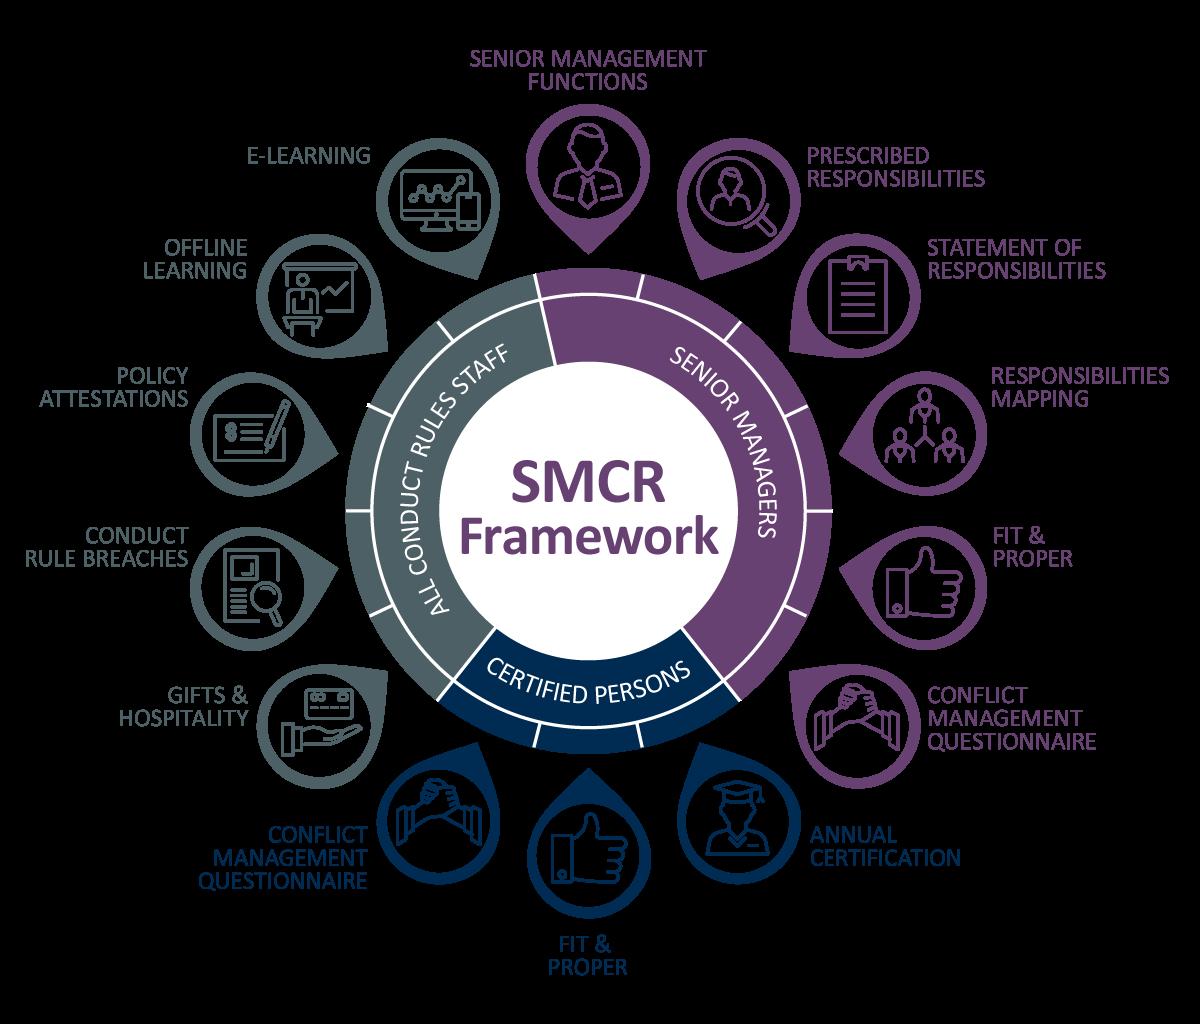 SMCR Framework